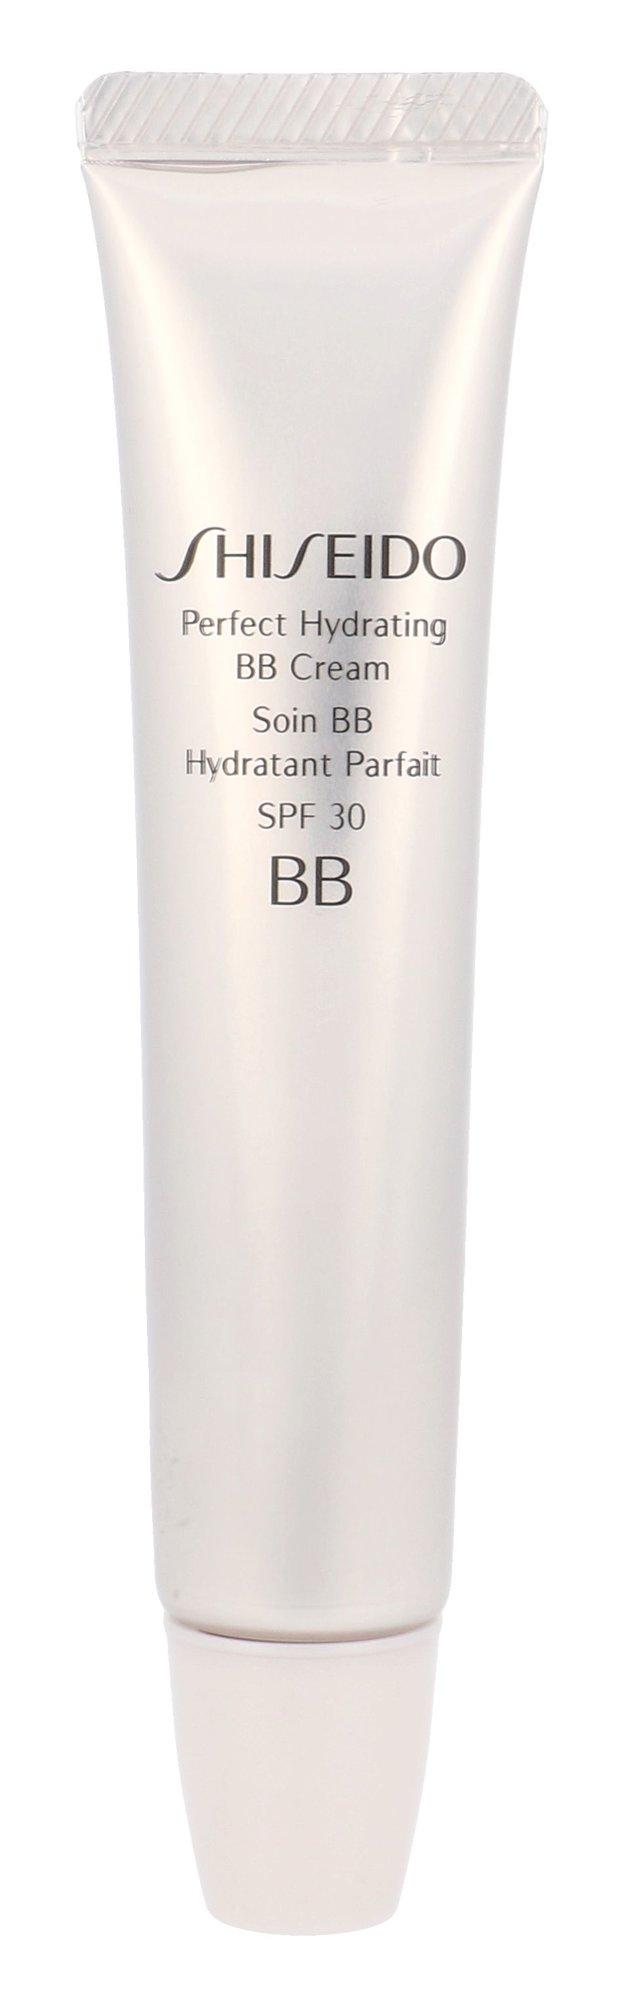 Shiseido Perfect Hydrating Cosmetic 30ml Medium